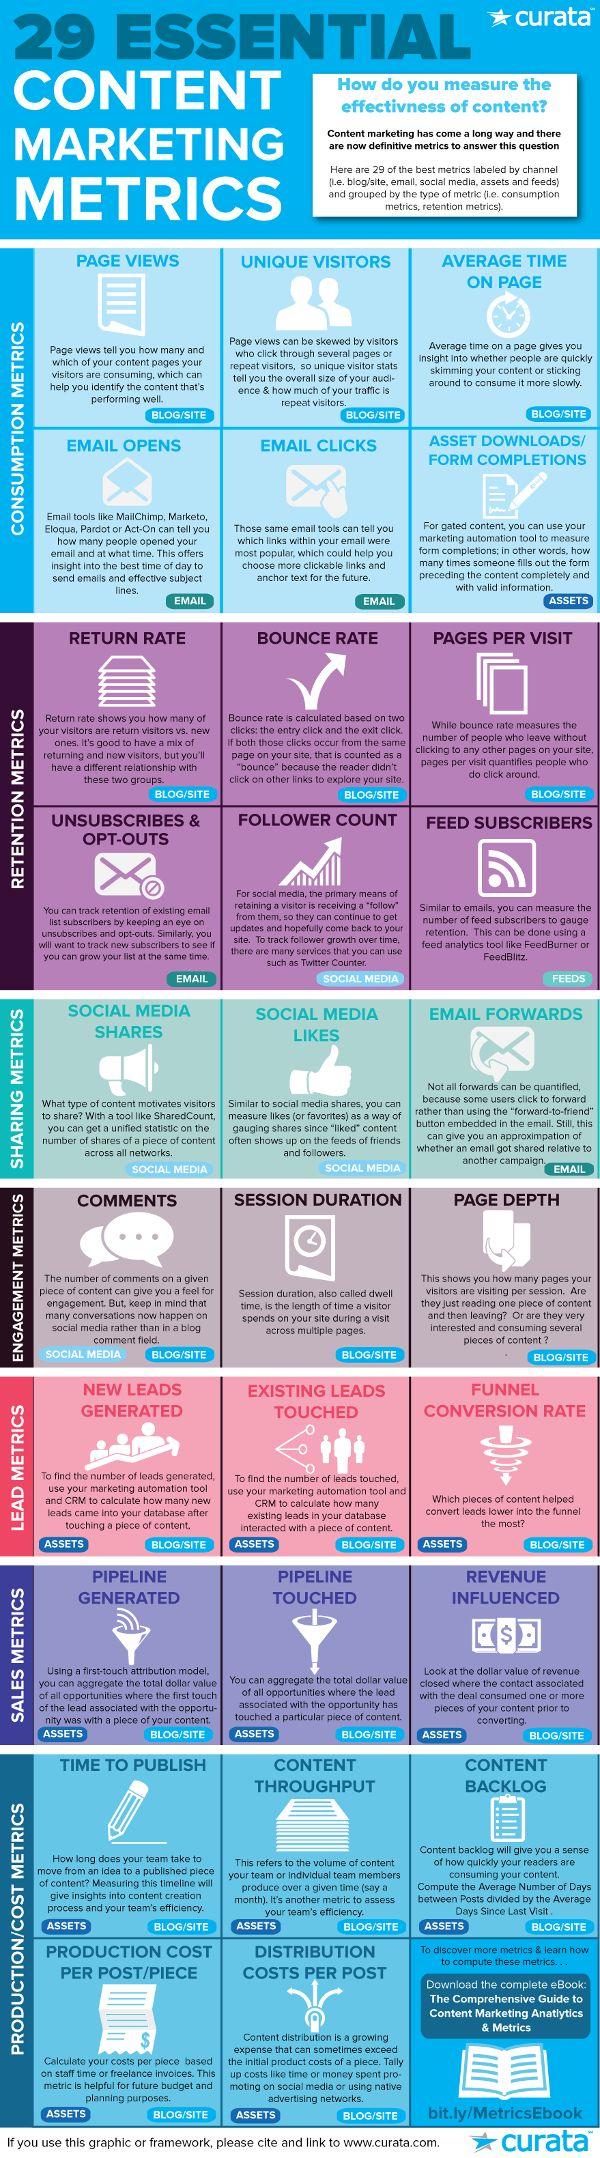 29 essential content marketing metrics - Infographic